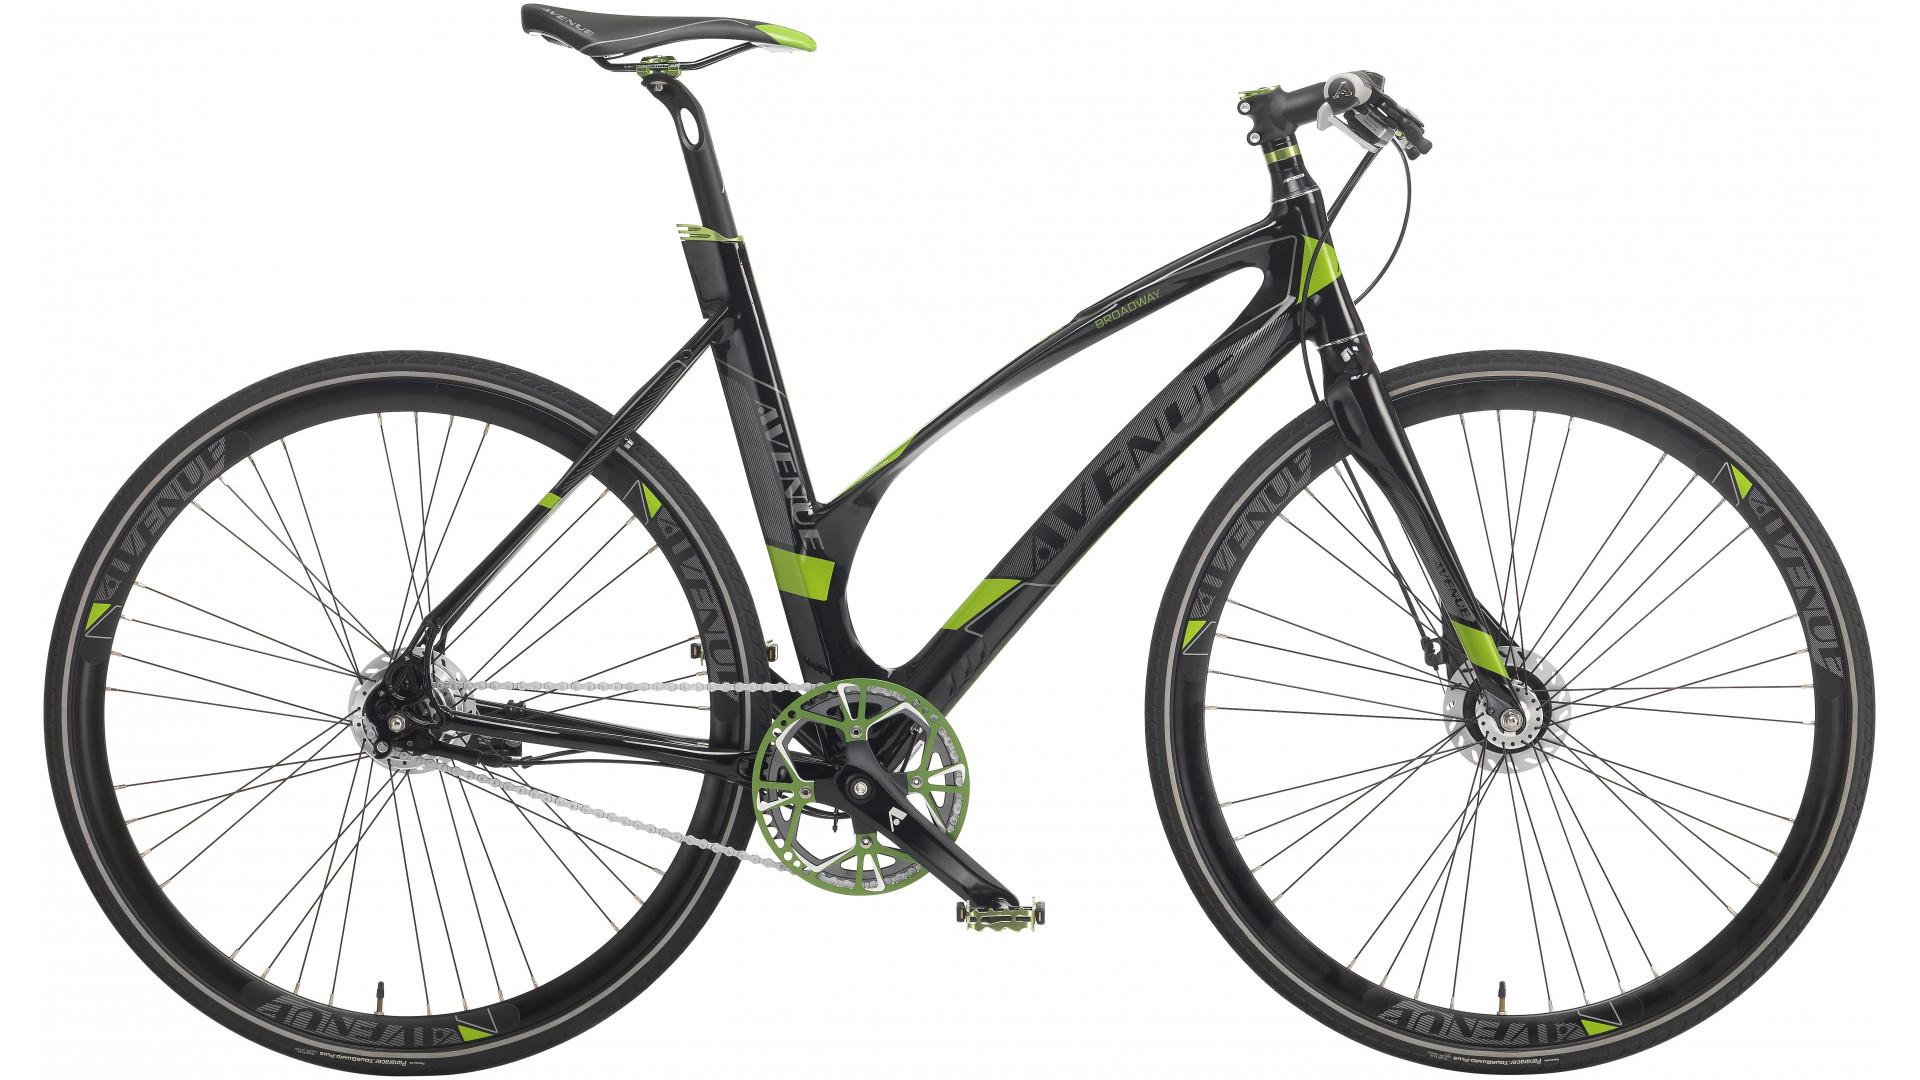 Avenue Broadway Herre Nexus 7g RB 2020 - Hvid | city-cykel